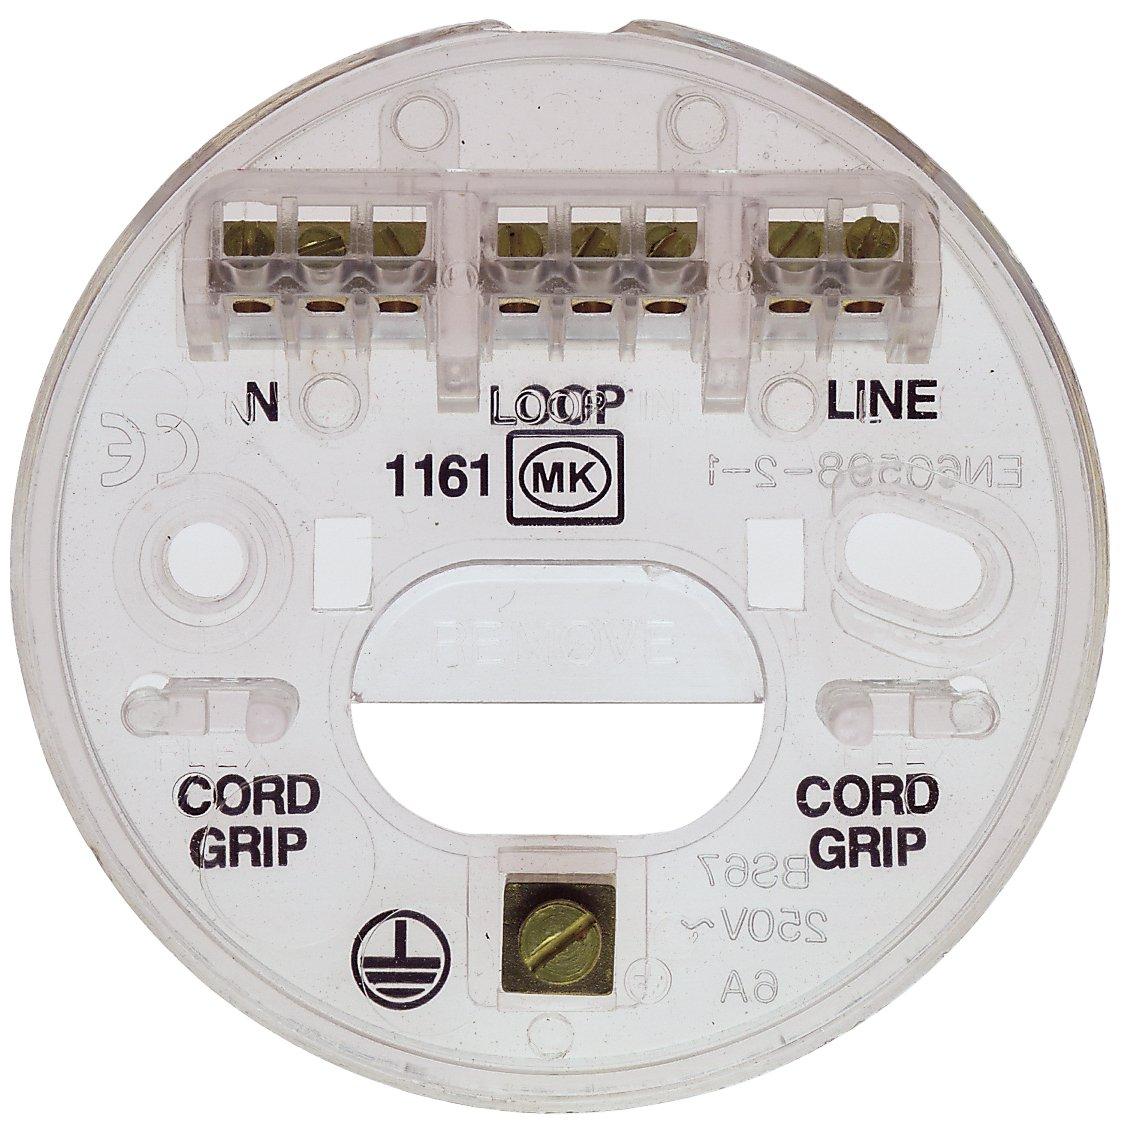 Mk K1161rpwhi Ceiling Rose 4 Terminal Incl Loop In Electrical Wiring Junction Further Flex Fifth Diy Tools